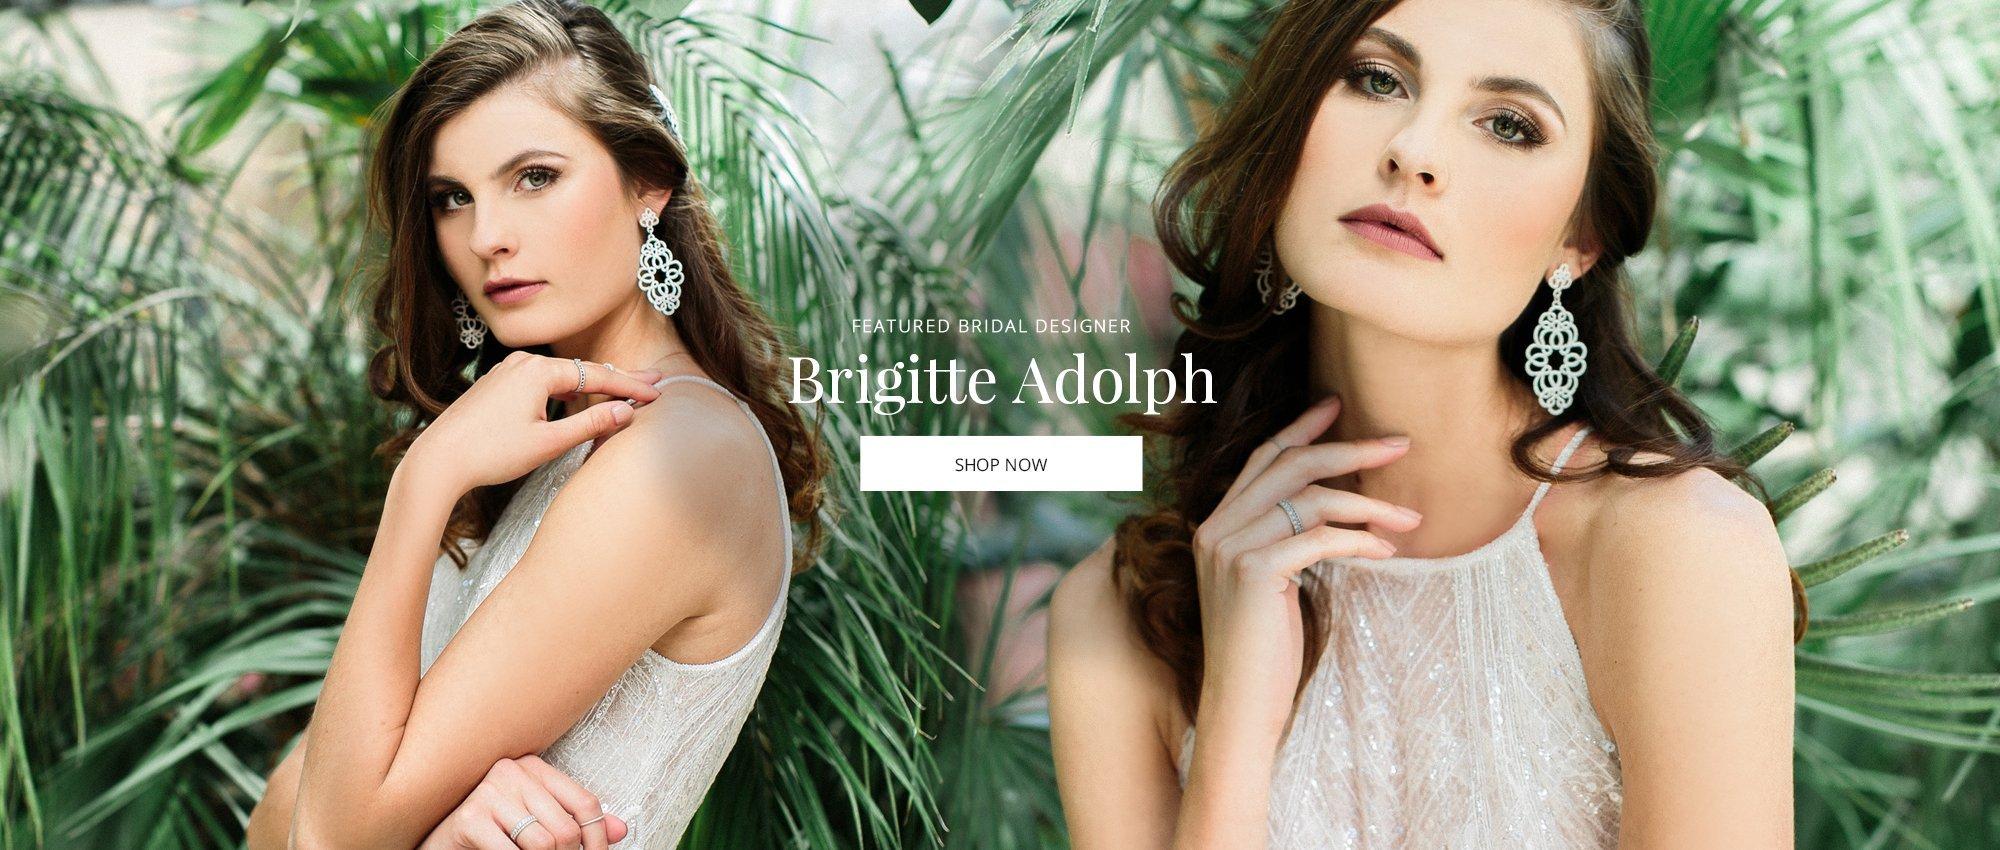 Brigitte Adolph Jewelry Design